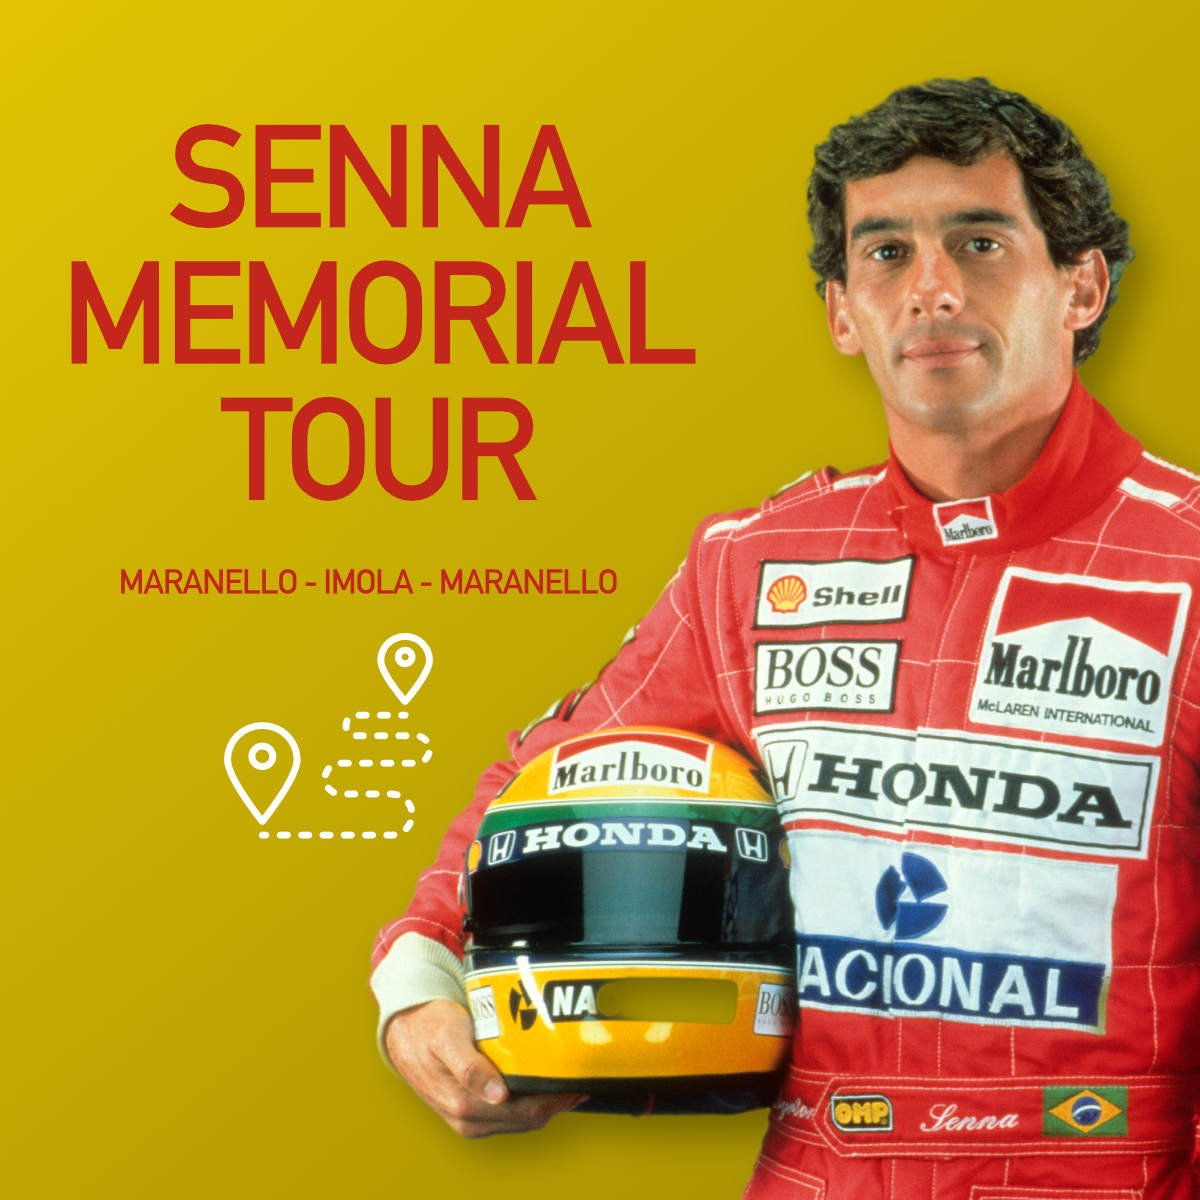 Senna Memorial Tour in Ferrari